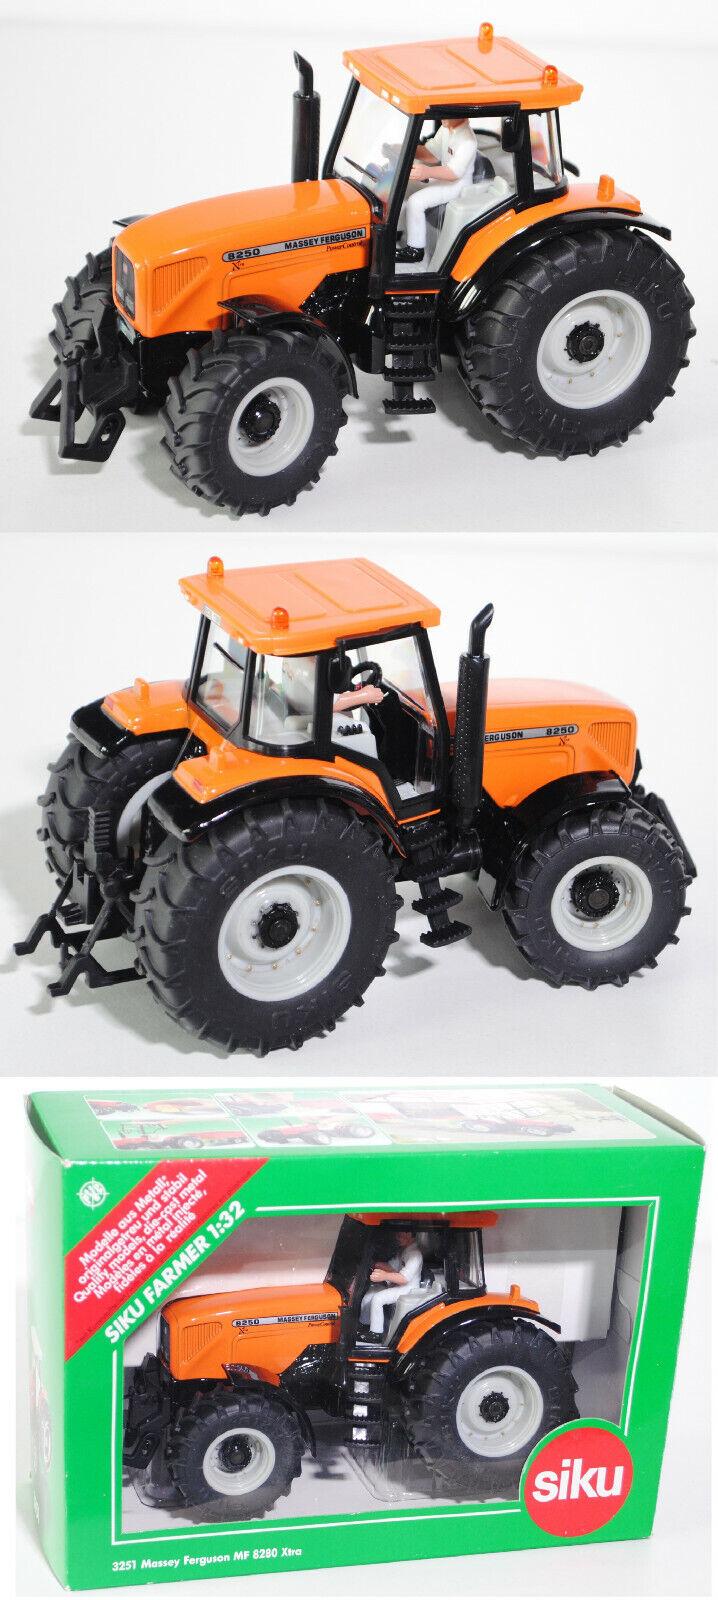 SIKU FARMER 3251 Massey Ferguson 8250 Xtra Tracteur 1 32 Spécial Modèle sikumuseum